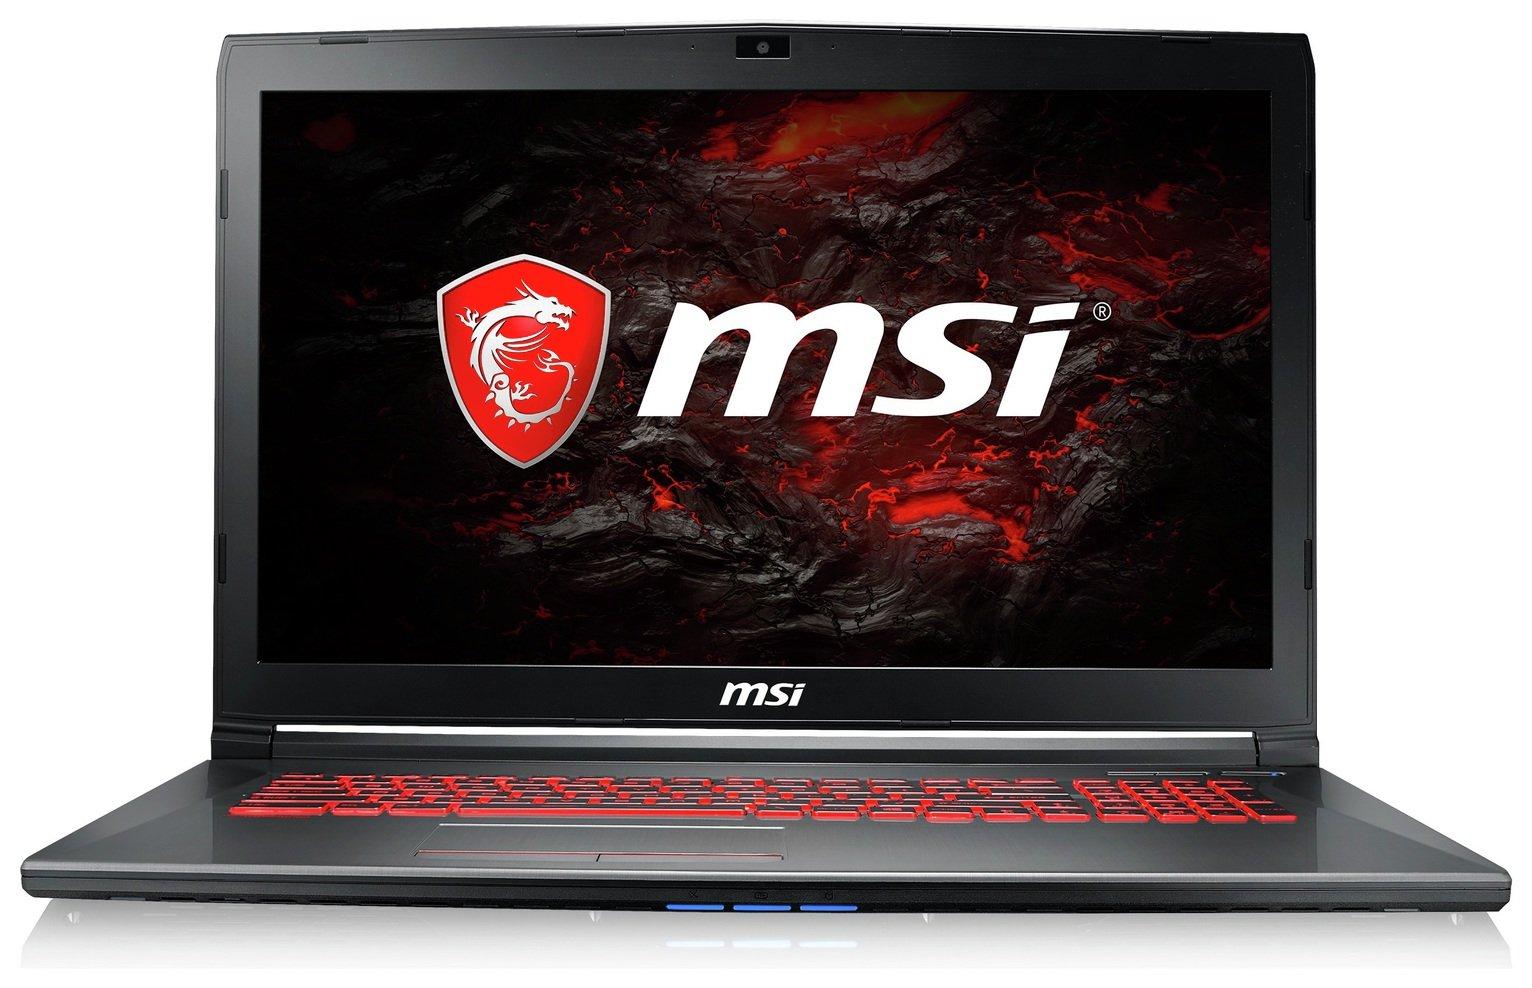 Msi MSI GV72 17 Inch 8GB 128GB 1TB GTX1050TI Gaming Laptop